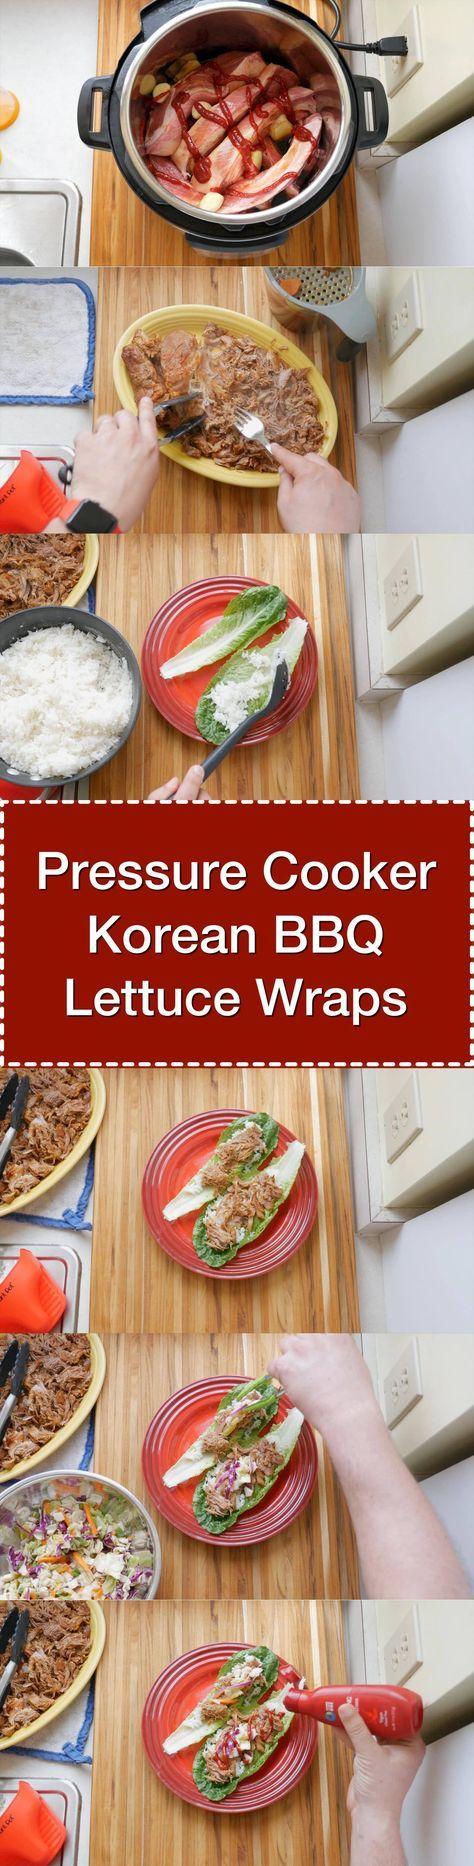 Pressure Cooker Korean BBQ Pork Lettuce Wraps - Step by step tower image | DadCooksDinner.com